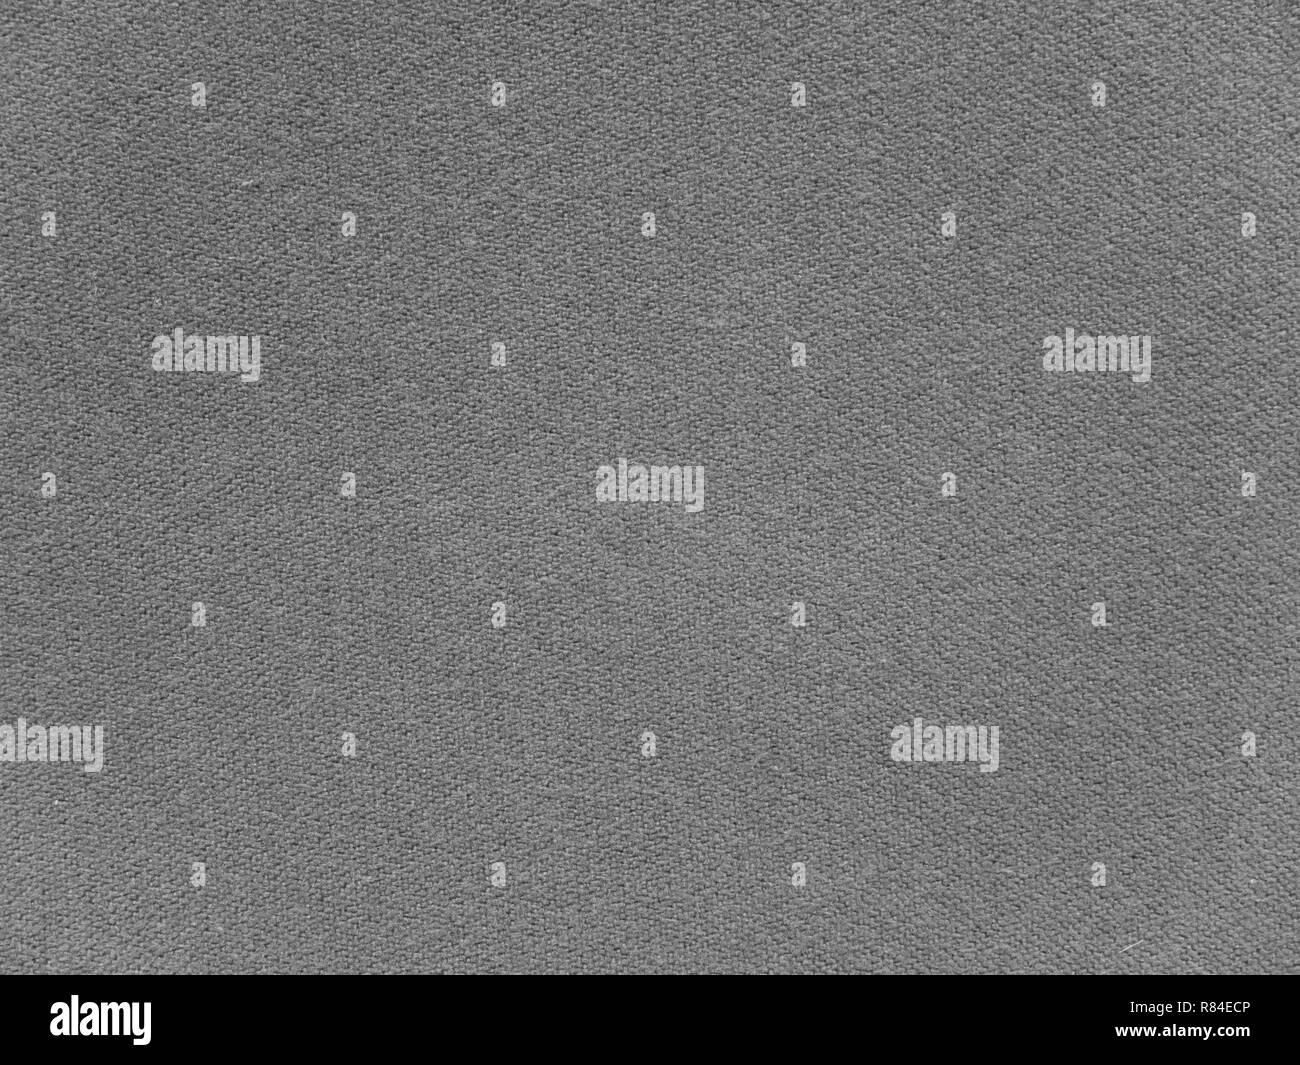 Microfiber towel gray terry fabric texture swatch. - Stock Image